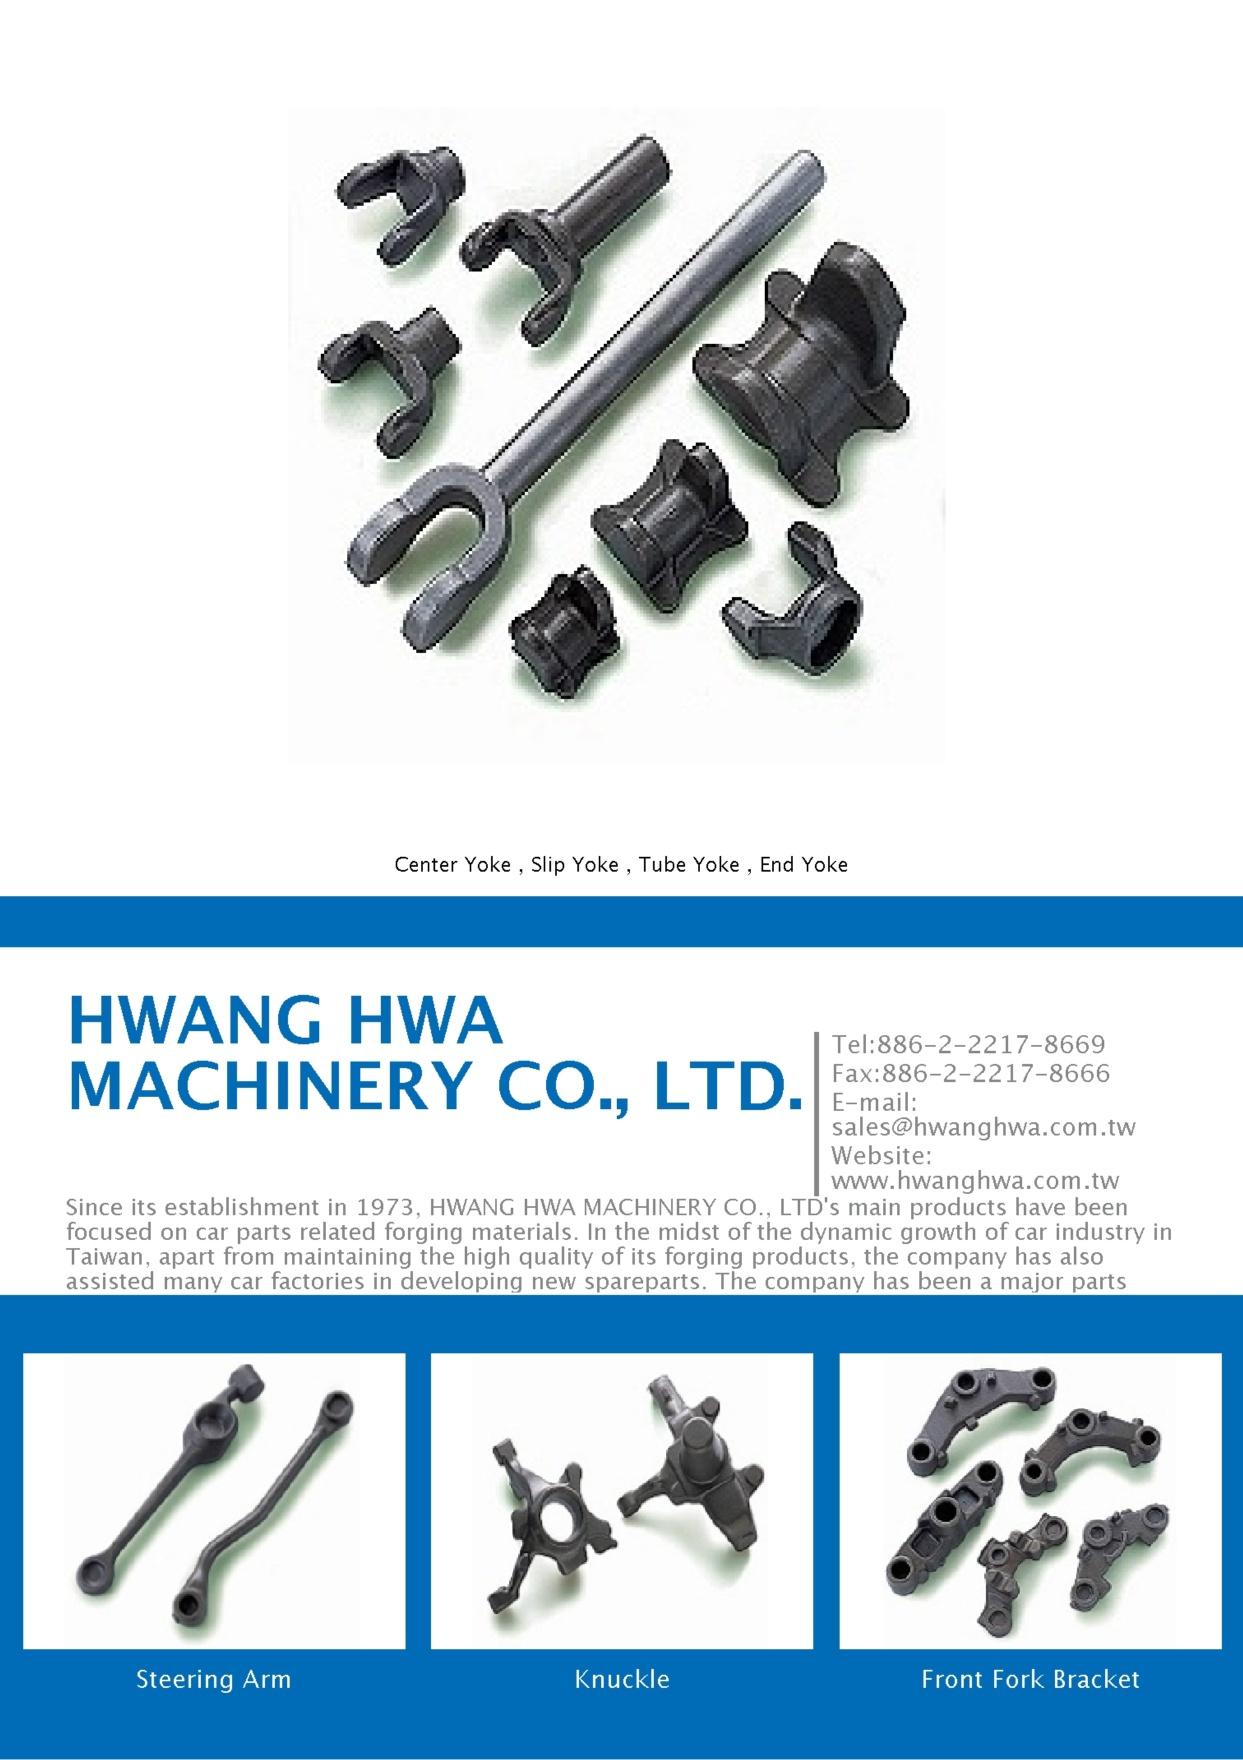 HWANG HWA MACHINERY CO., LTD.